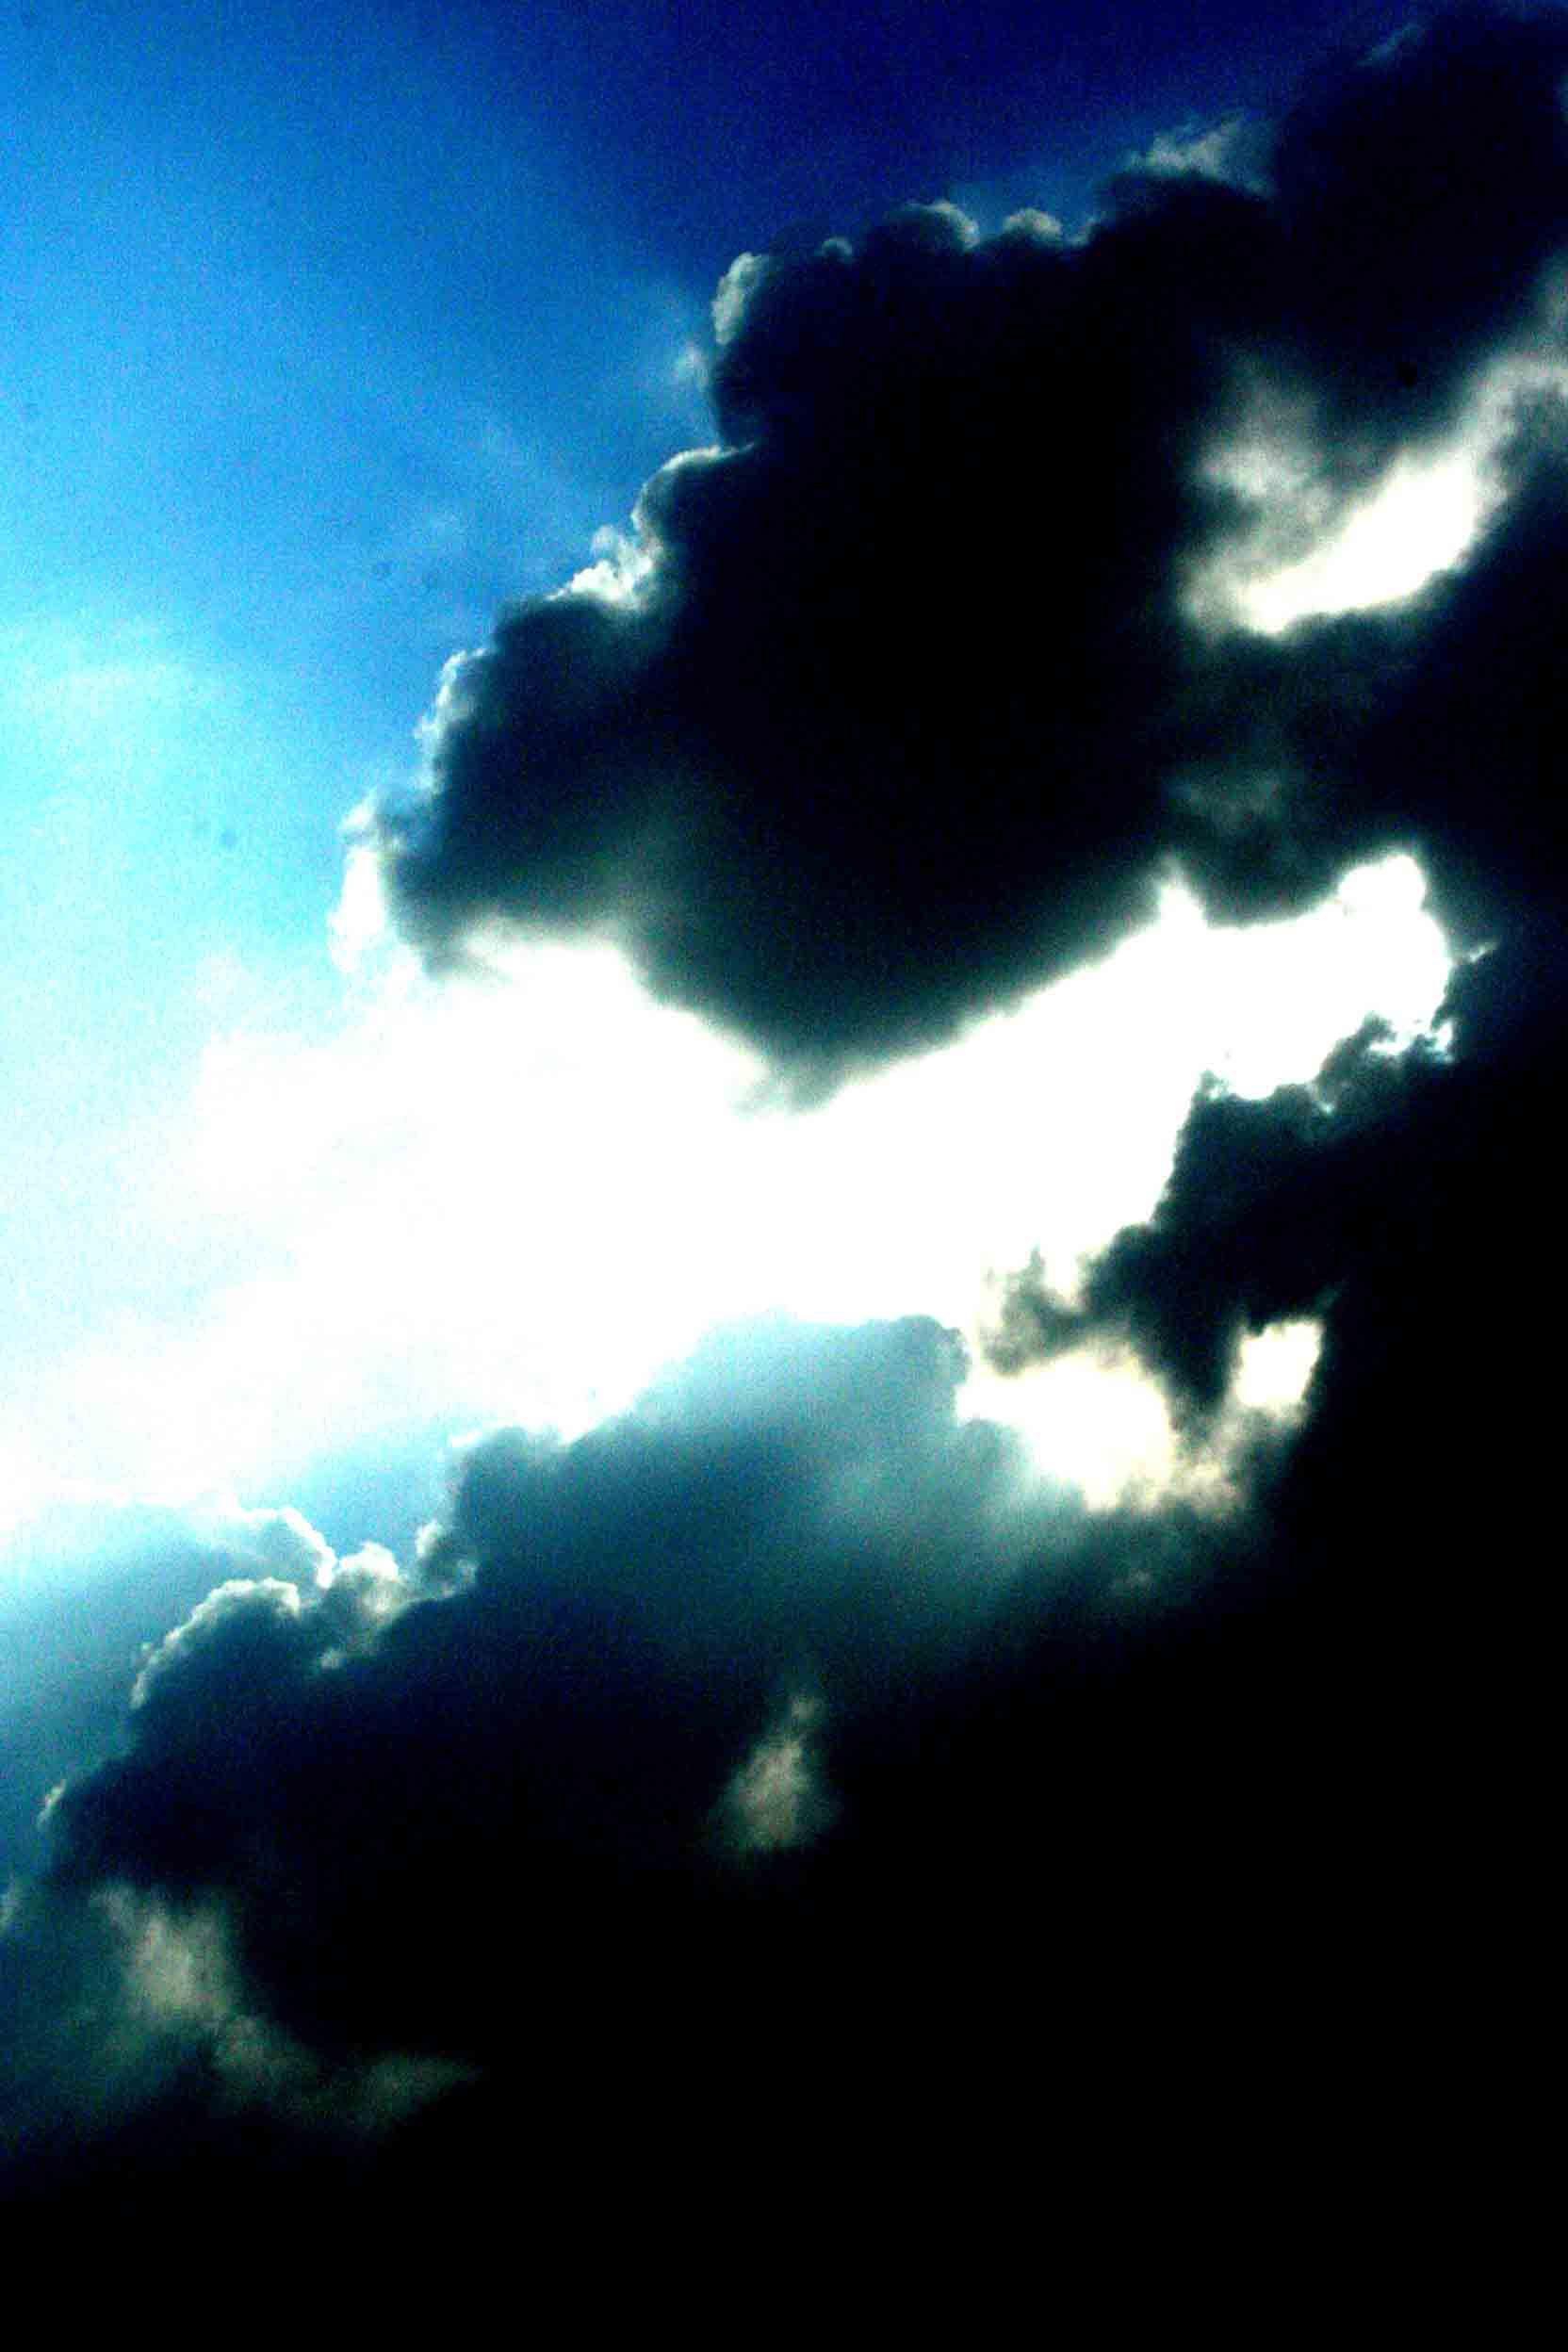 Godzilla Cloud Godzilla Clouds Kaiju